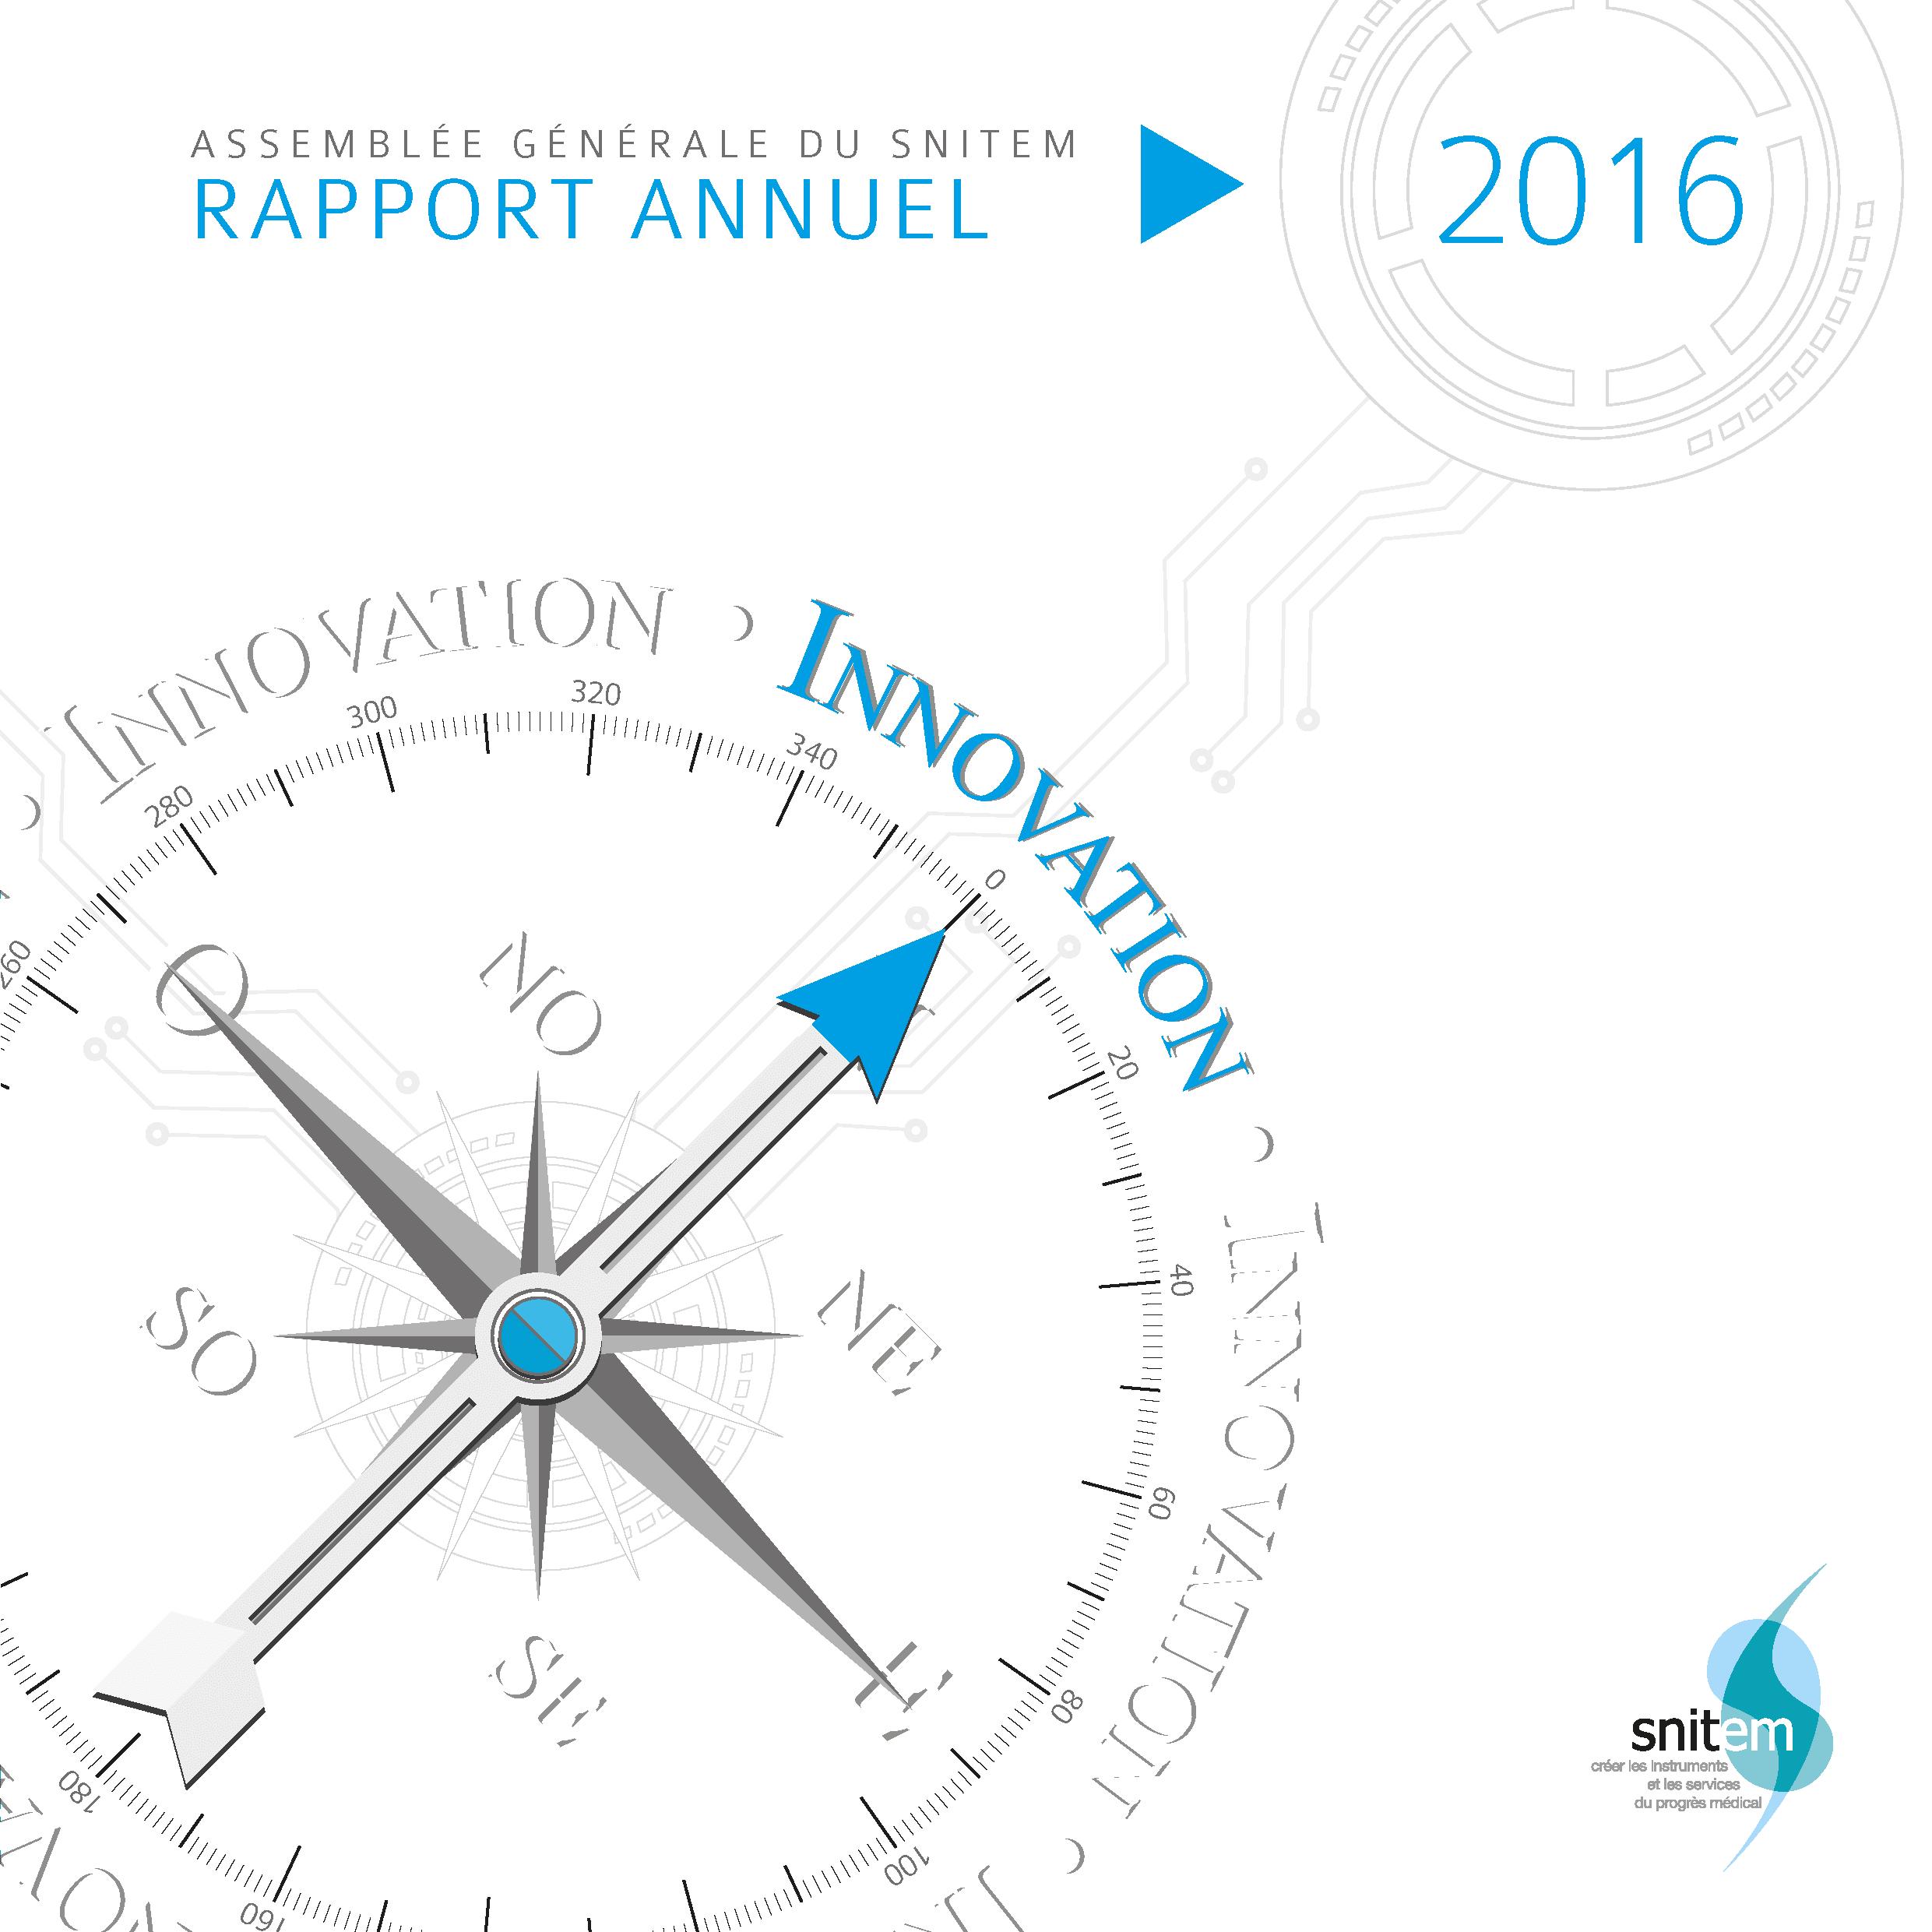 Rapport annuel du Snitem - 2016